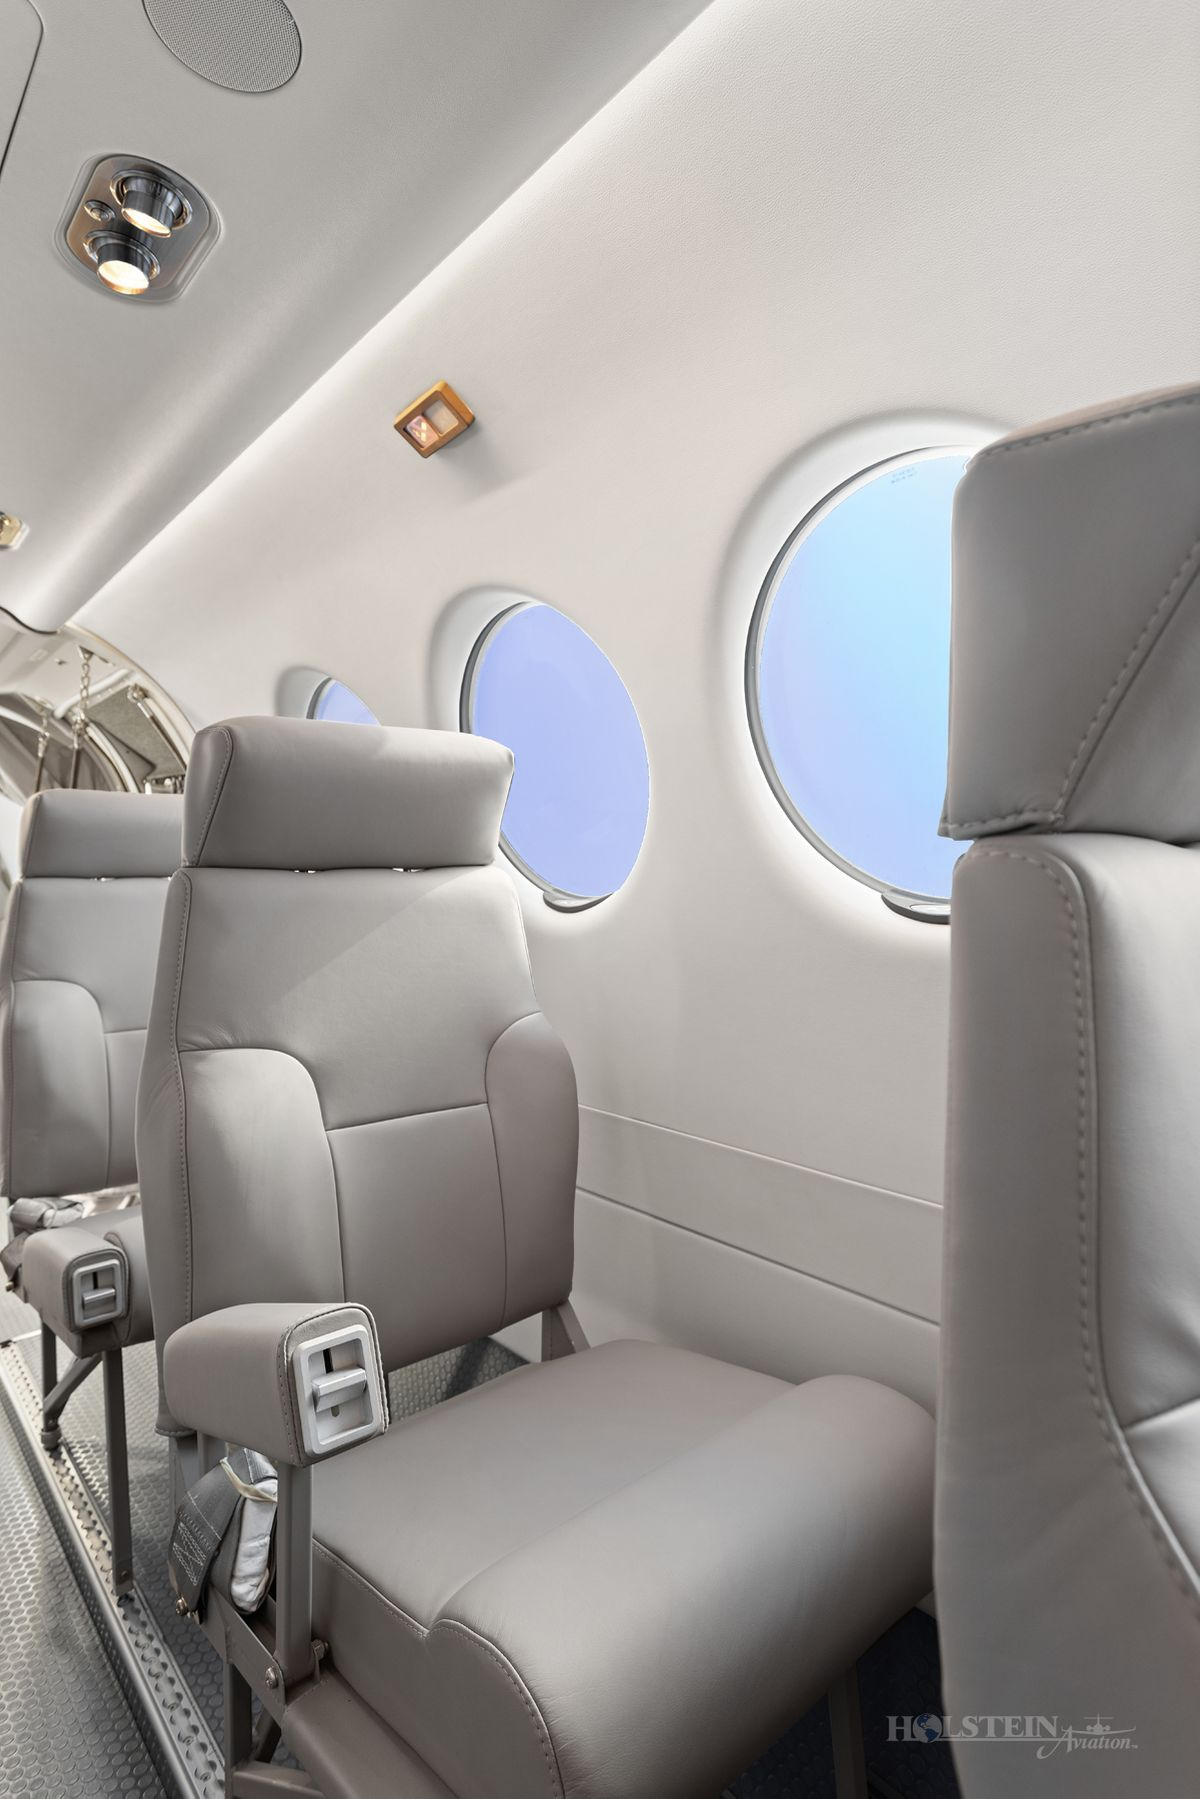 2018 King Air 350iER - FL-1157 - N1157F - Int - Seat w-Armrest Up 3 RGB.jpg